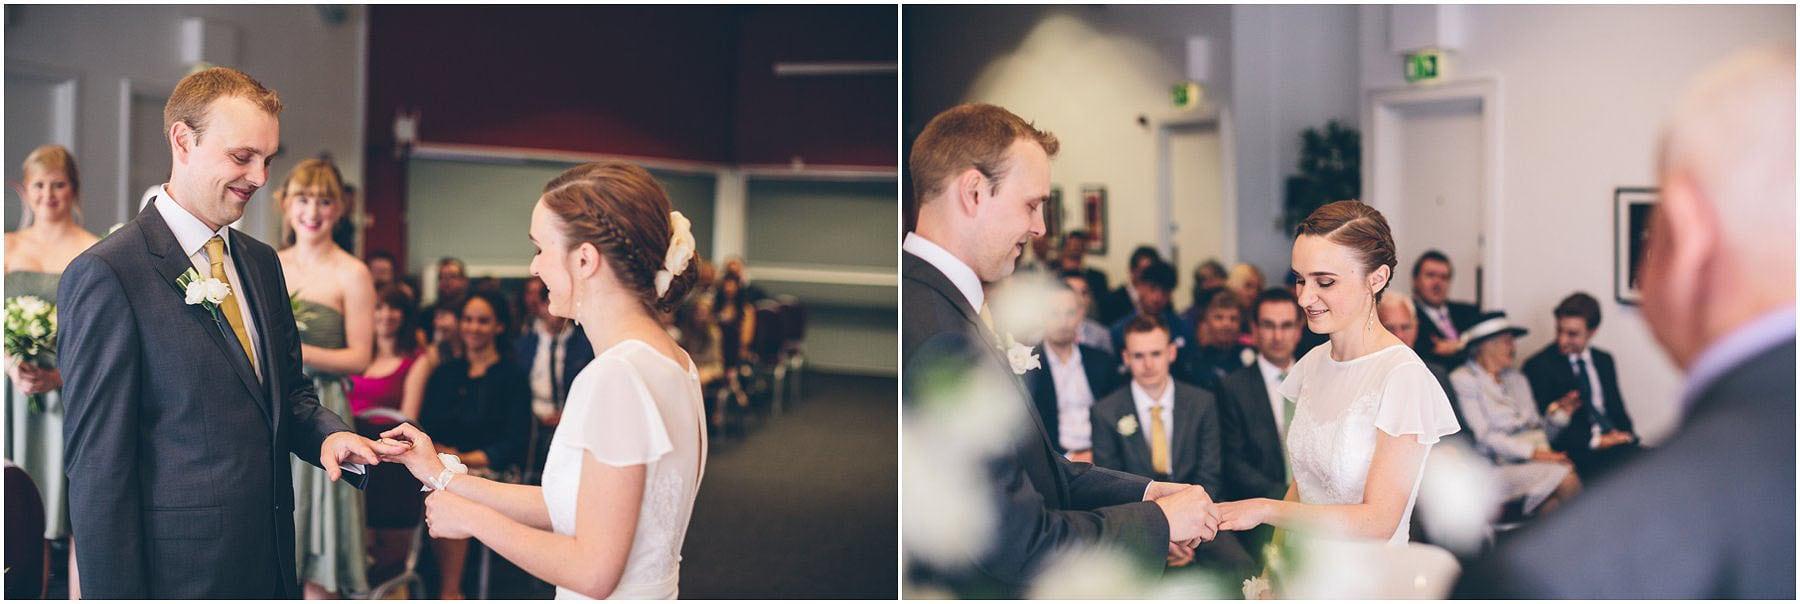 Lowry_Theatre_Wedding_Photography_0049